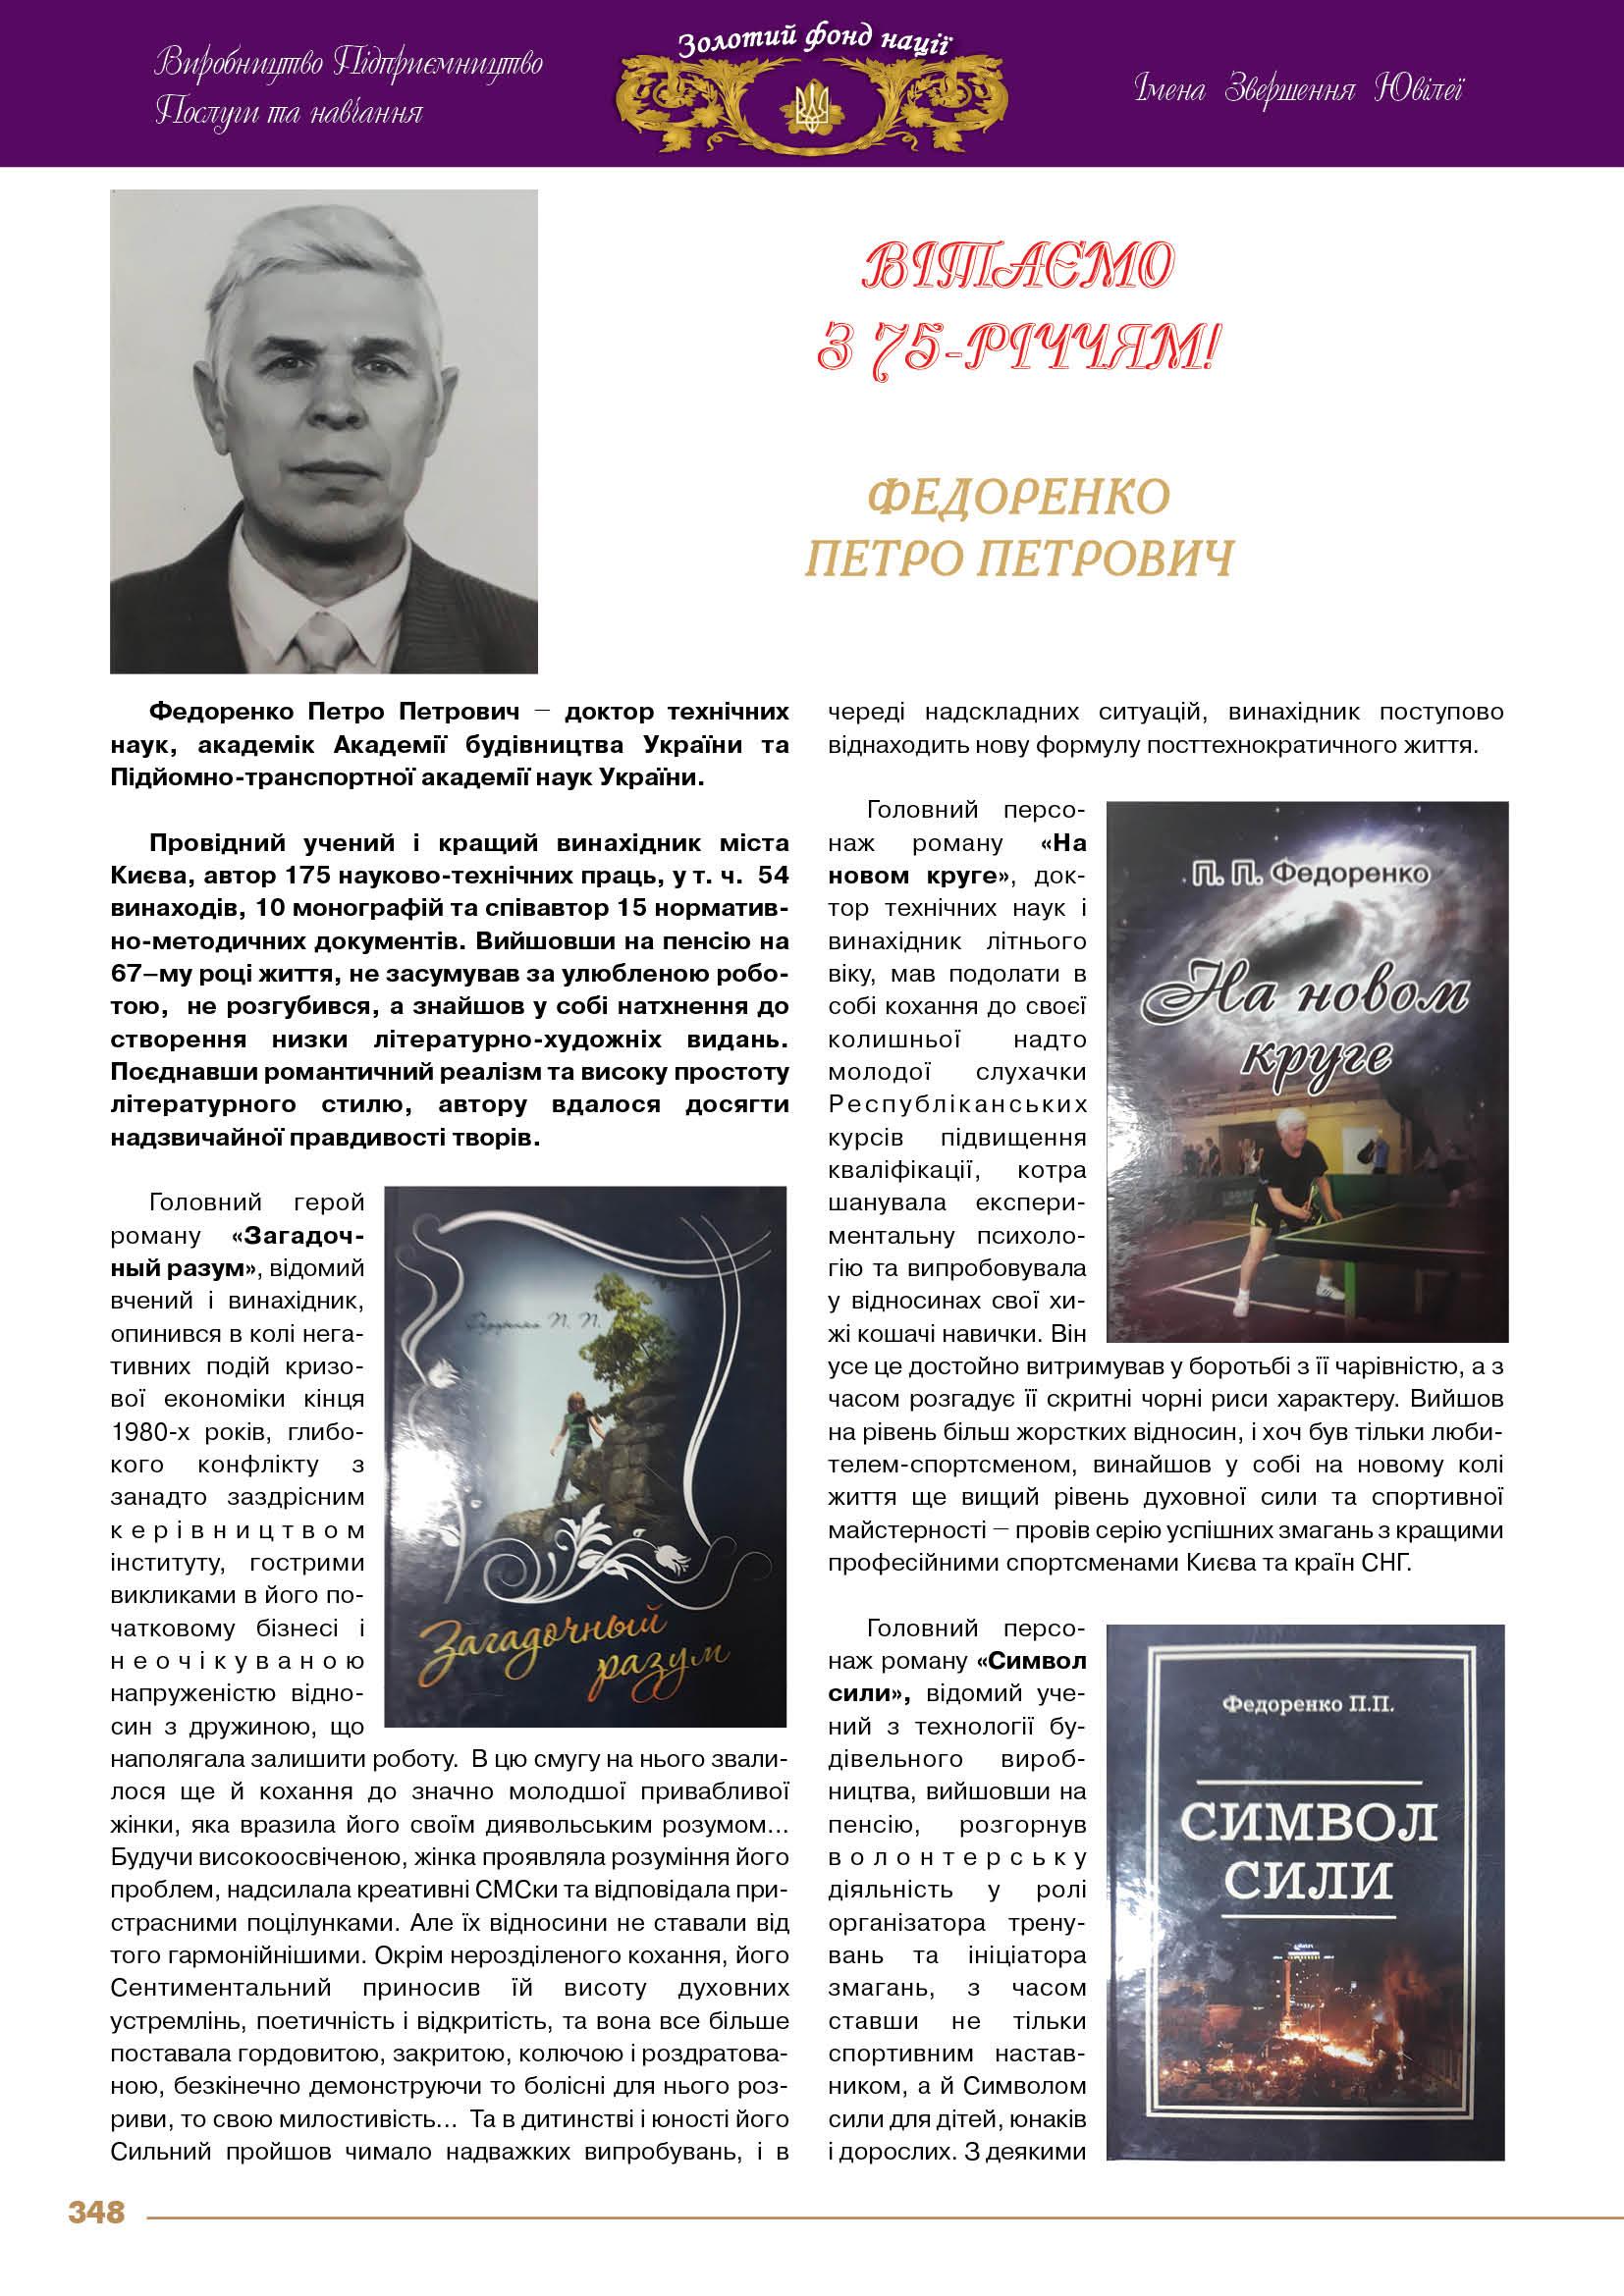 Федоренко  Петро Петрович